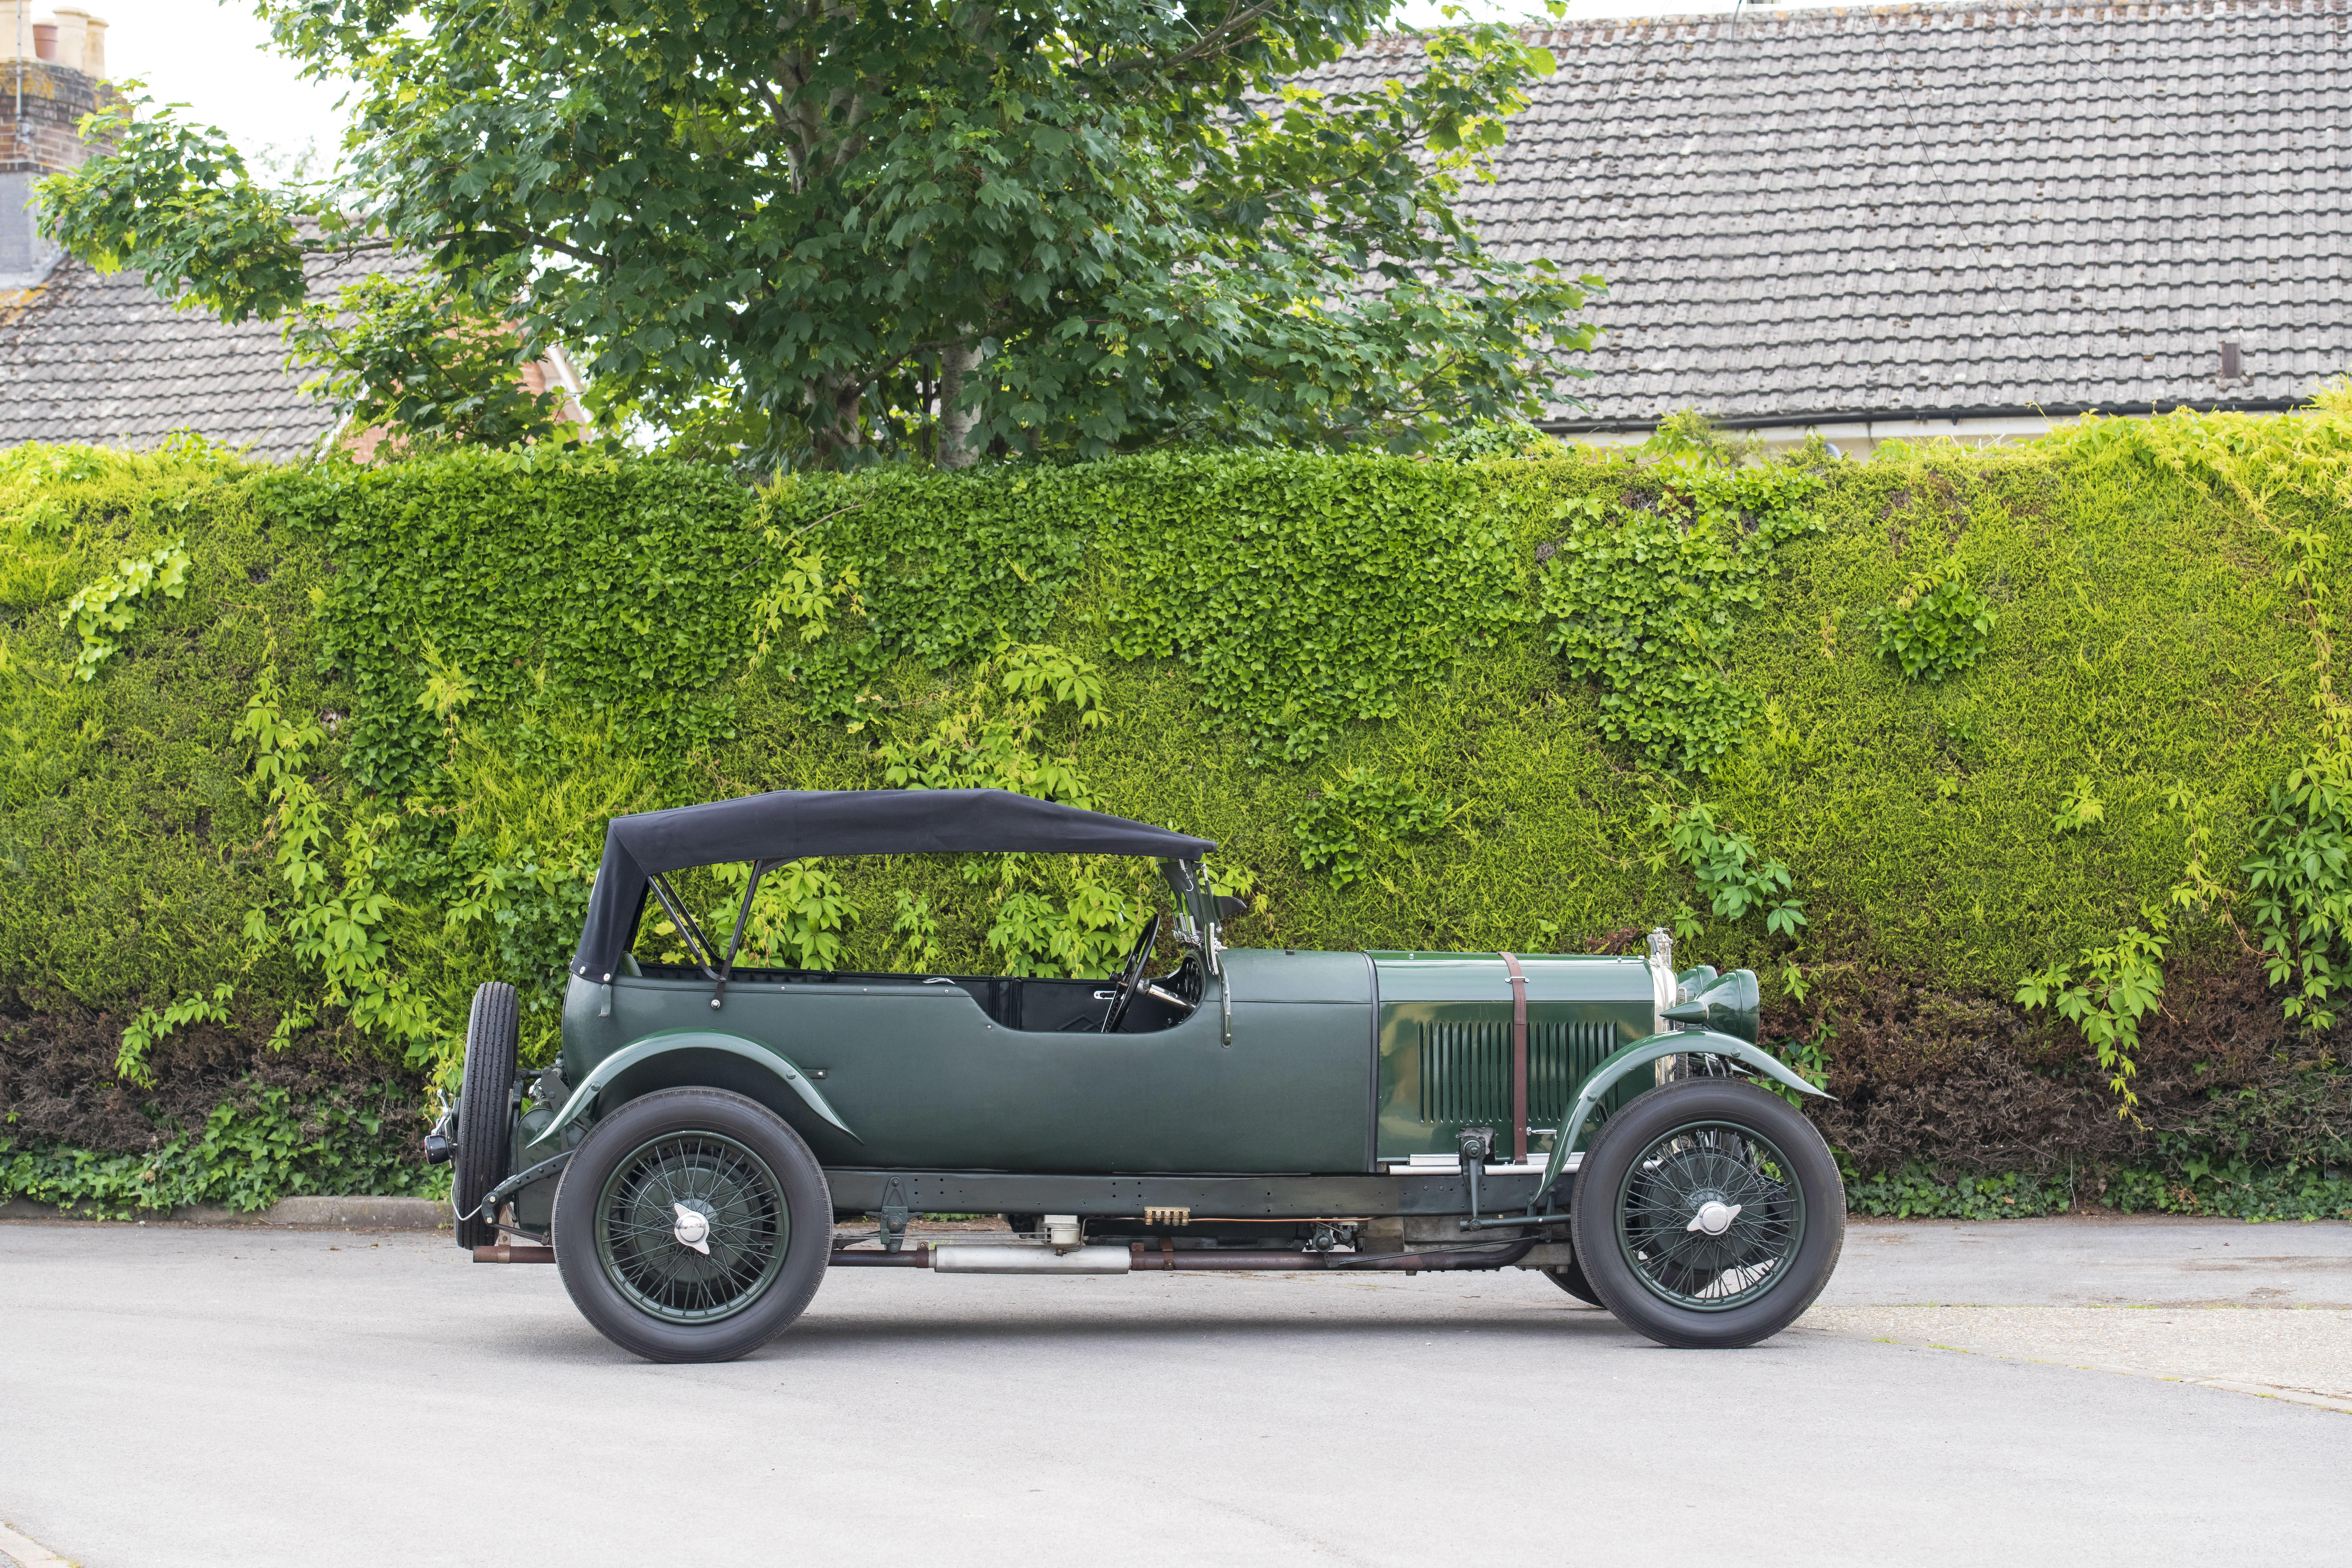 1929 Lagonda 2-Litre Low Chassis PK 9204